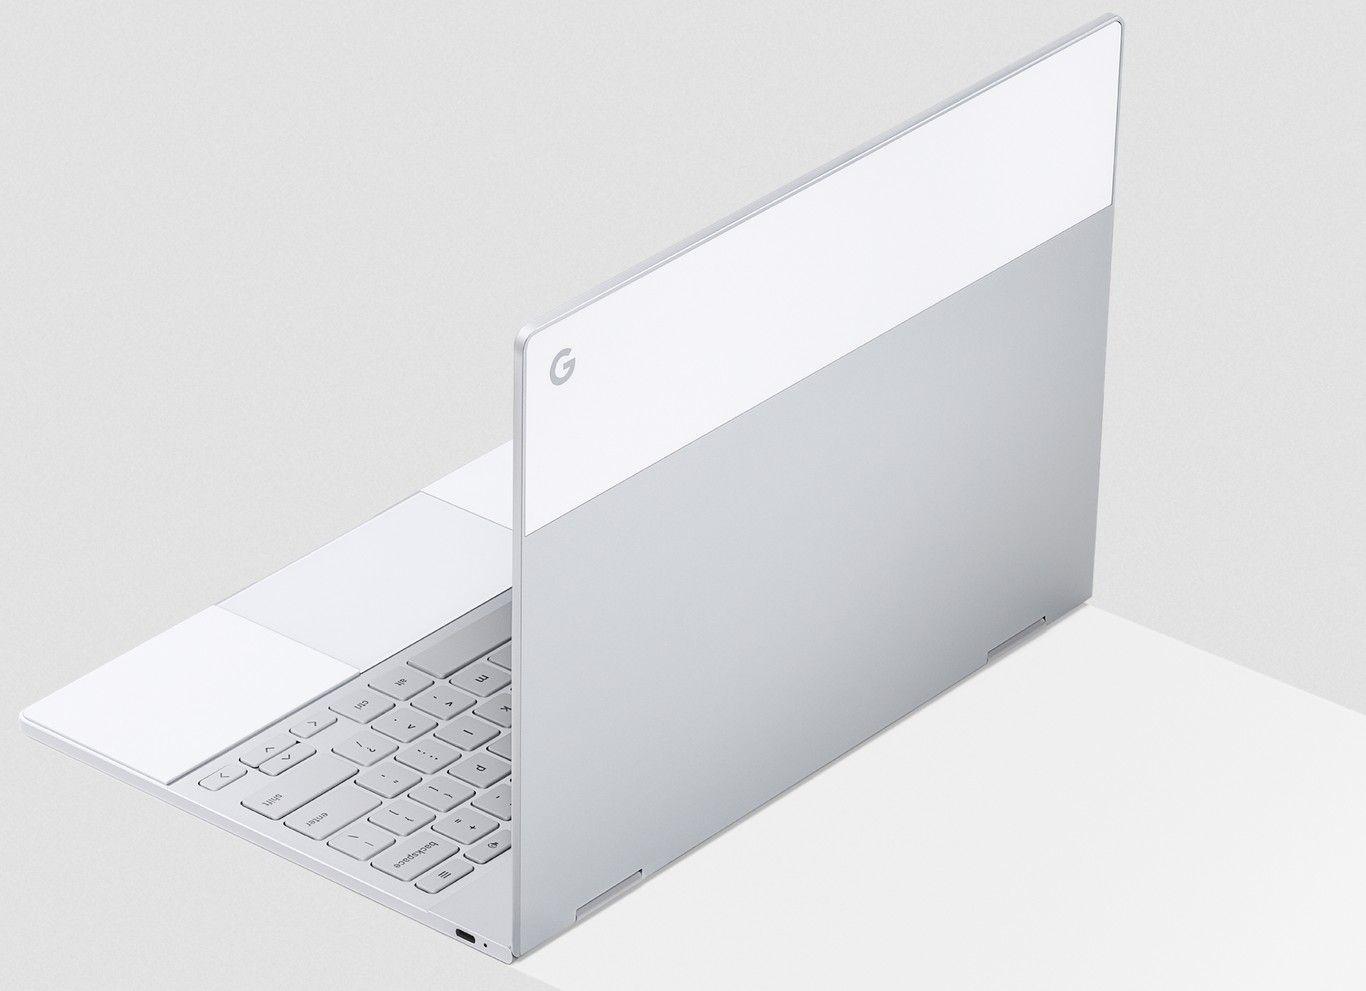 ofertas de la pixelbook